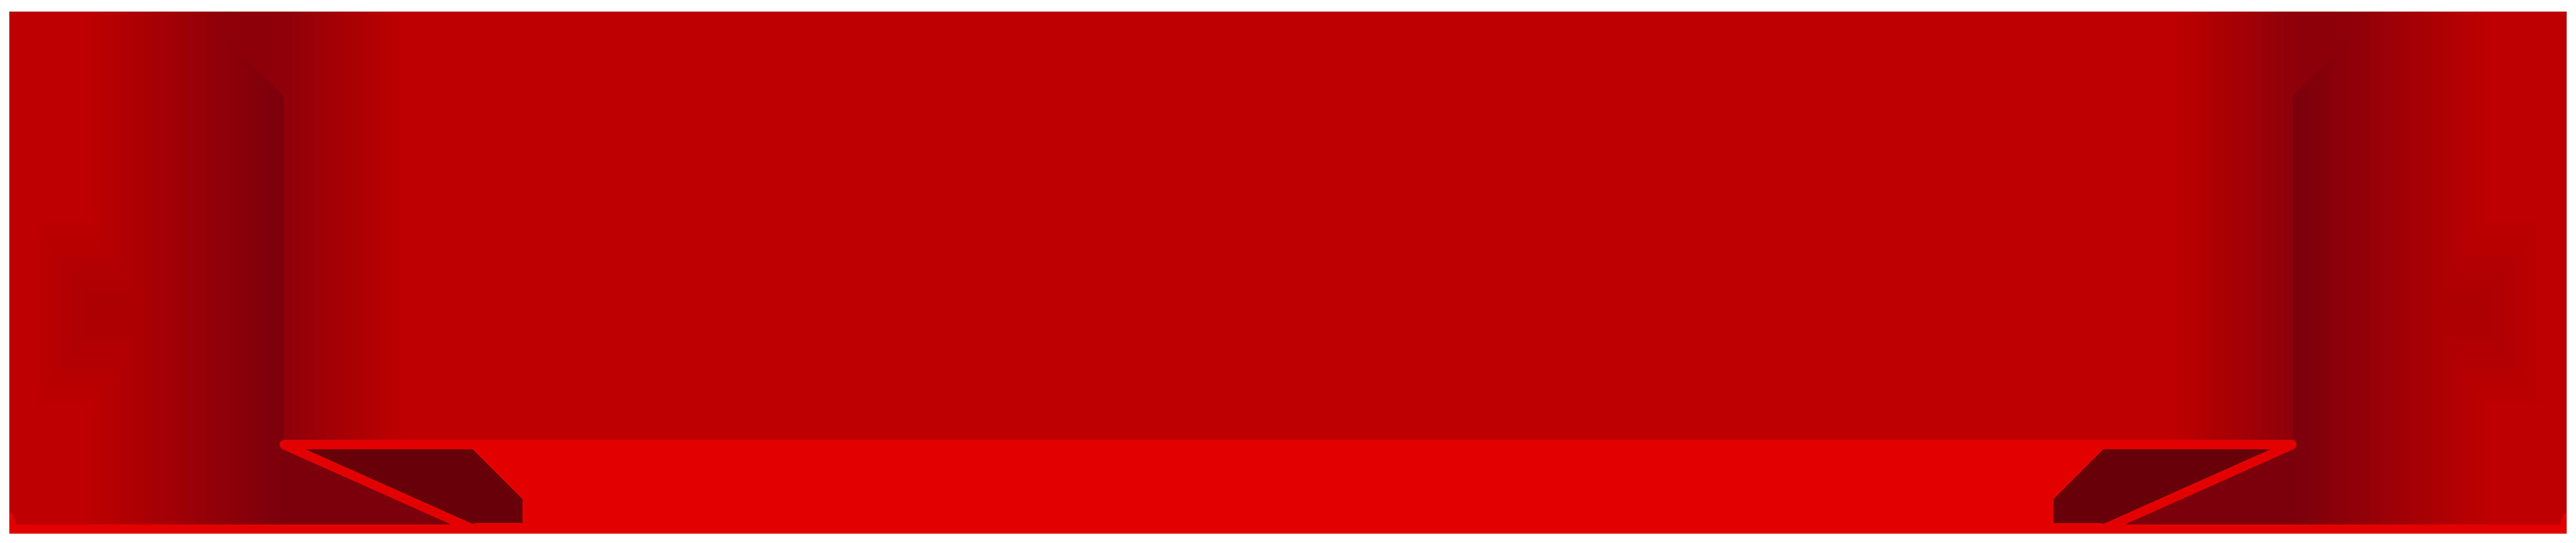 8000x1685 Red Banner Transparent Png Clip Art Imageu200b Gallery Yopriceville